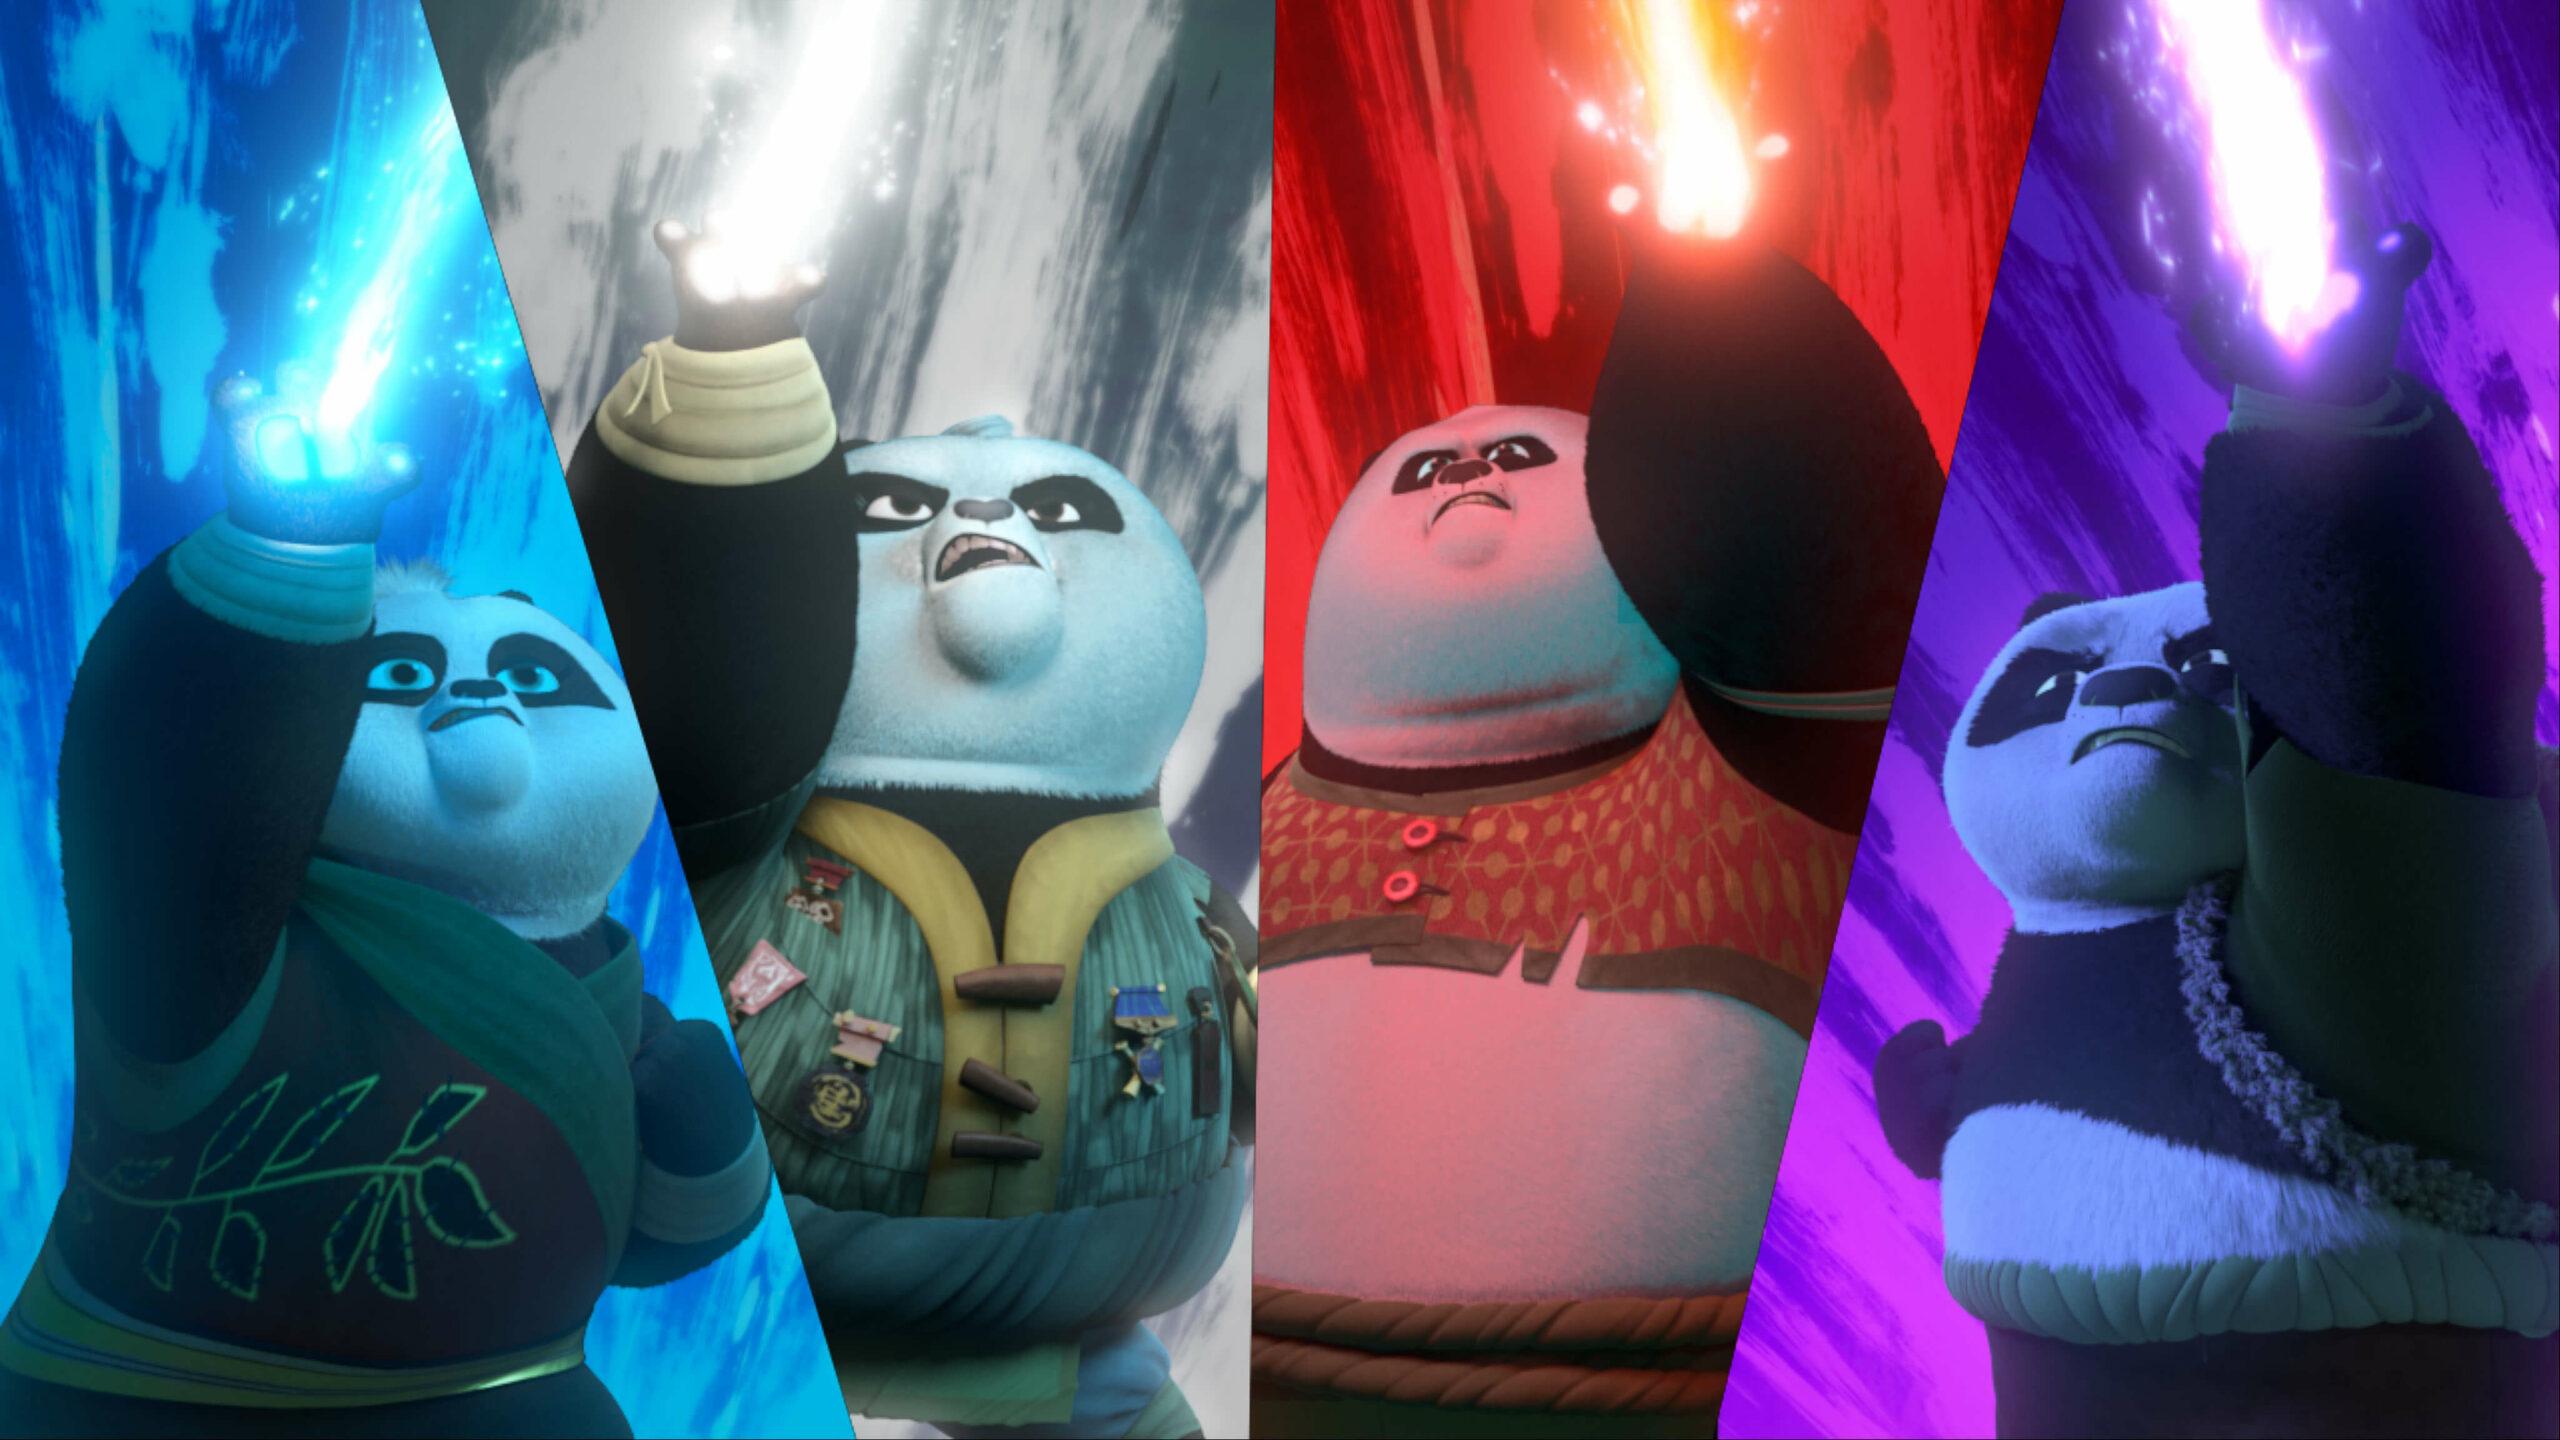 Kung Fu Panda 4 Is It Coming To The Big Screen Soon